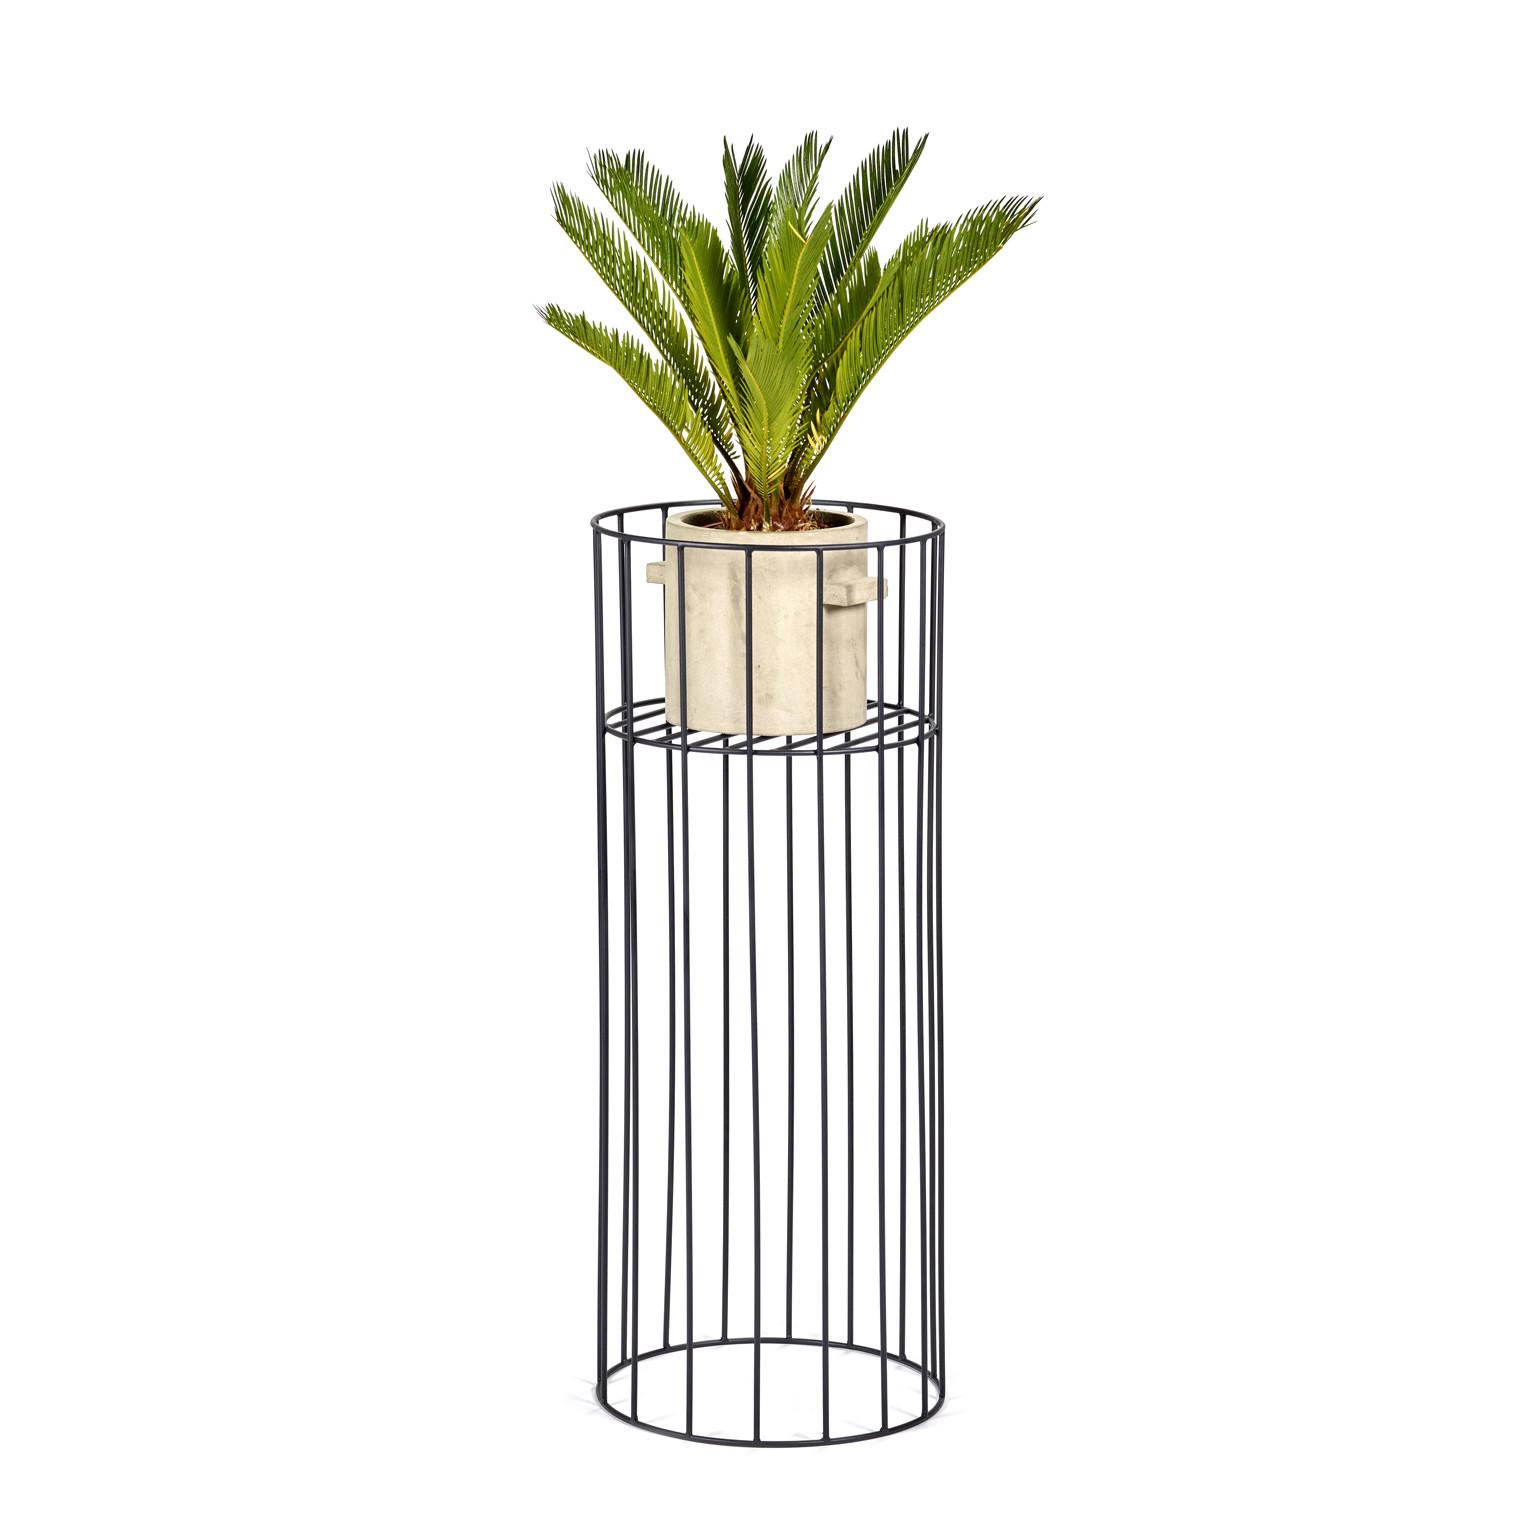 Plant Stand M | Black Vasaro